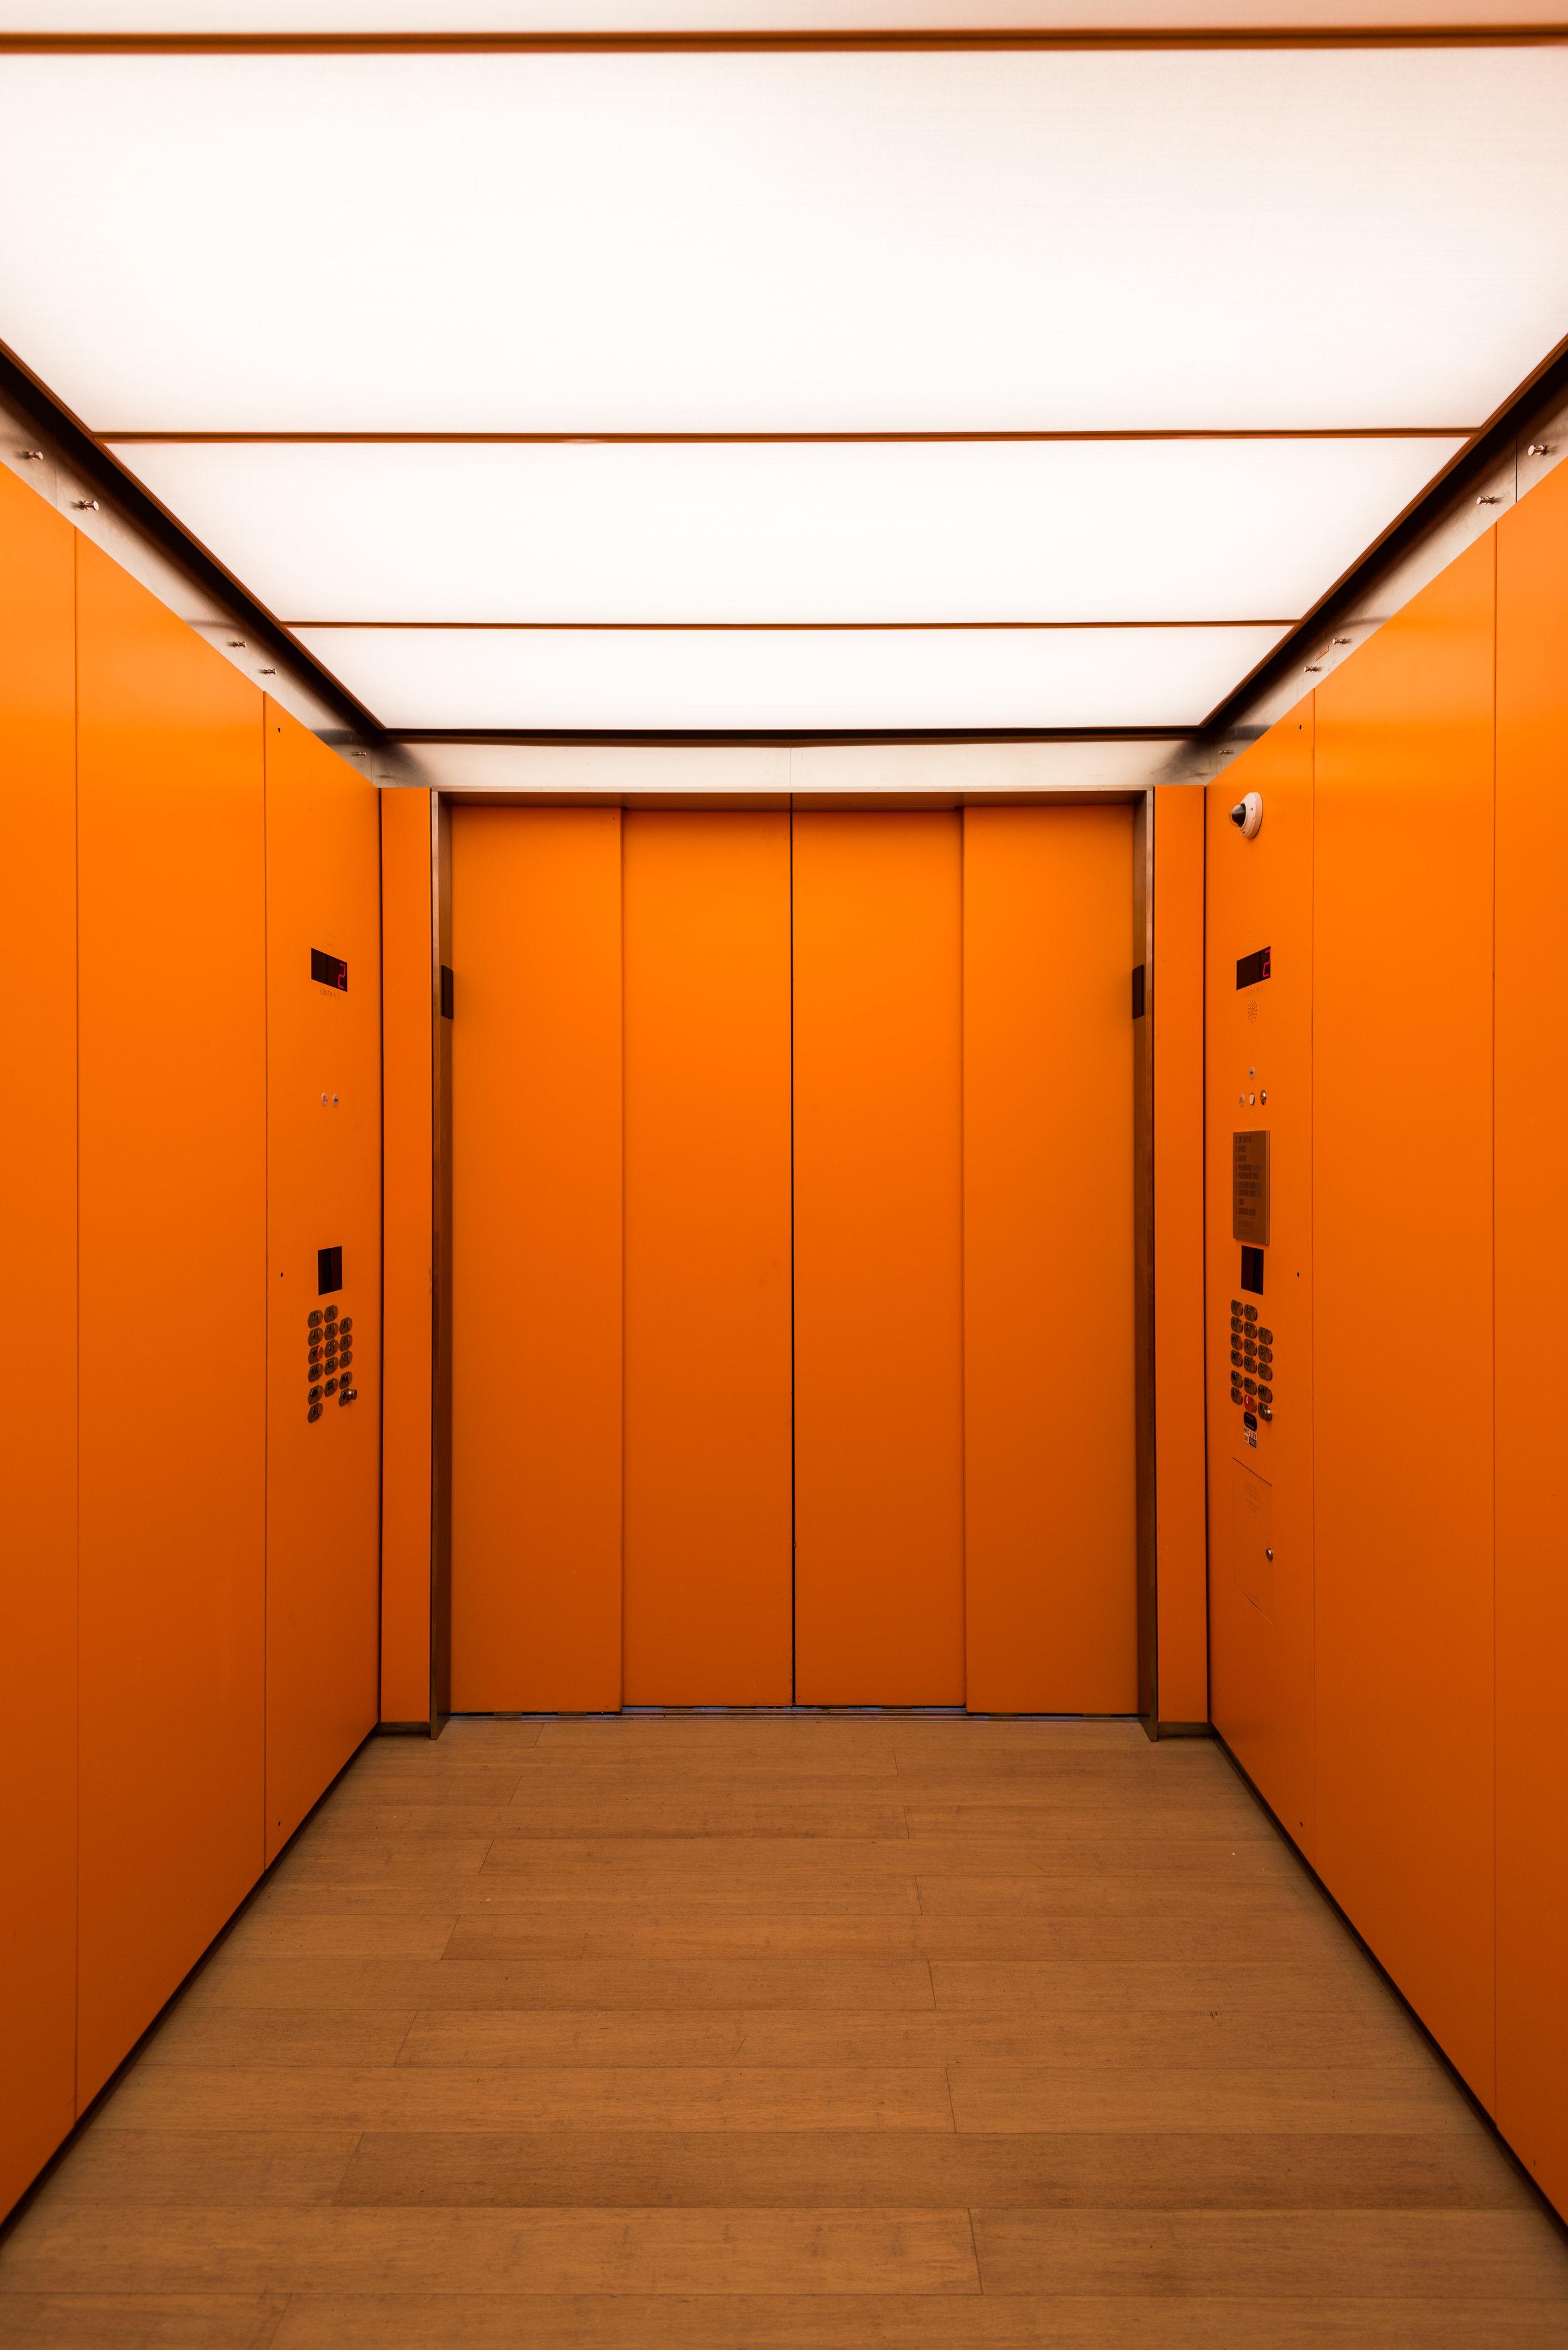 Elevator cab.